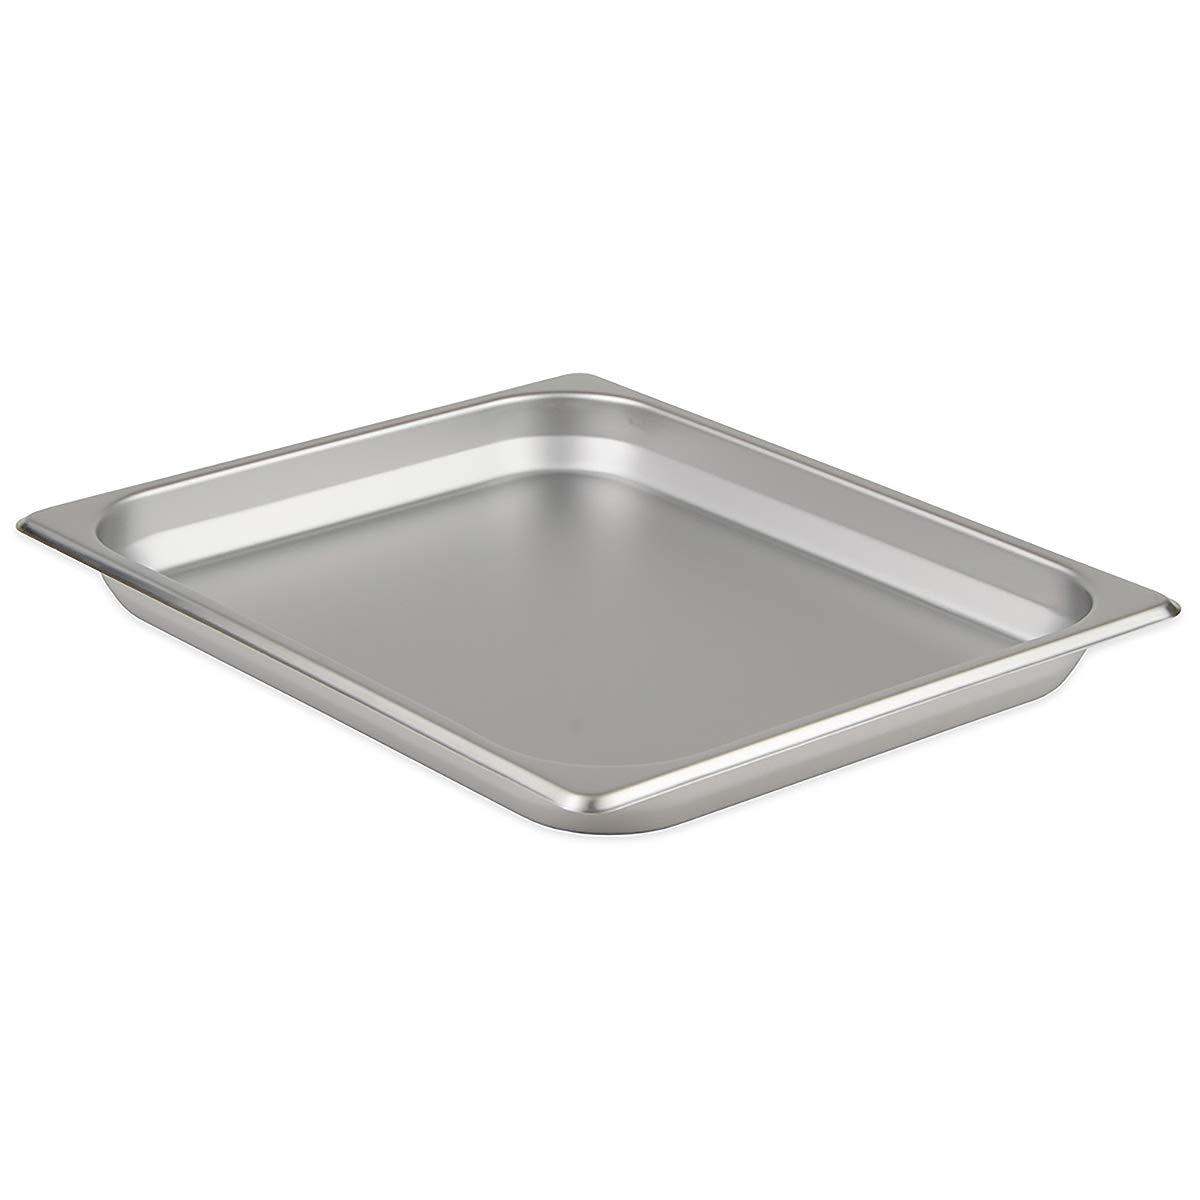 Update International SPH-501 Anti-Jam Steam Table Pan, Half Size, 1 4